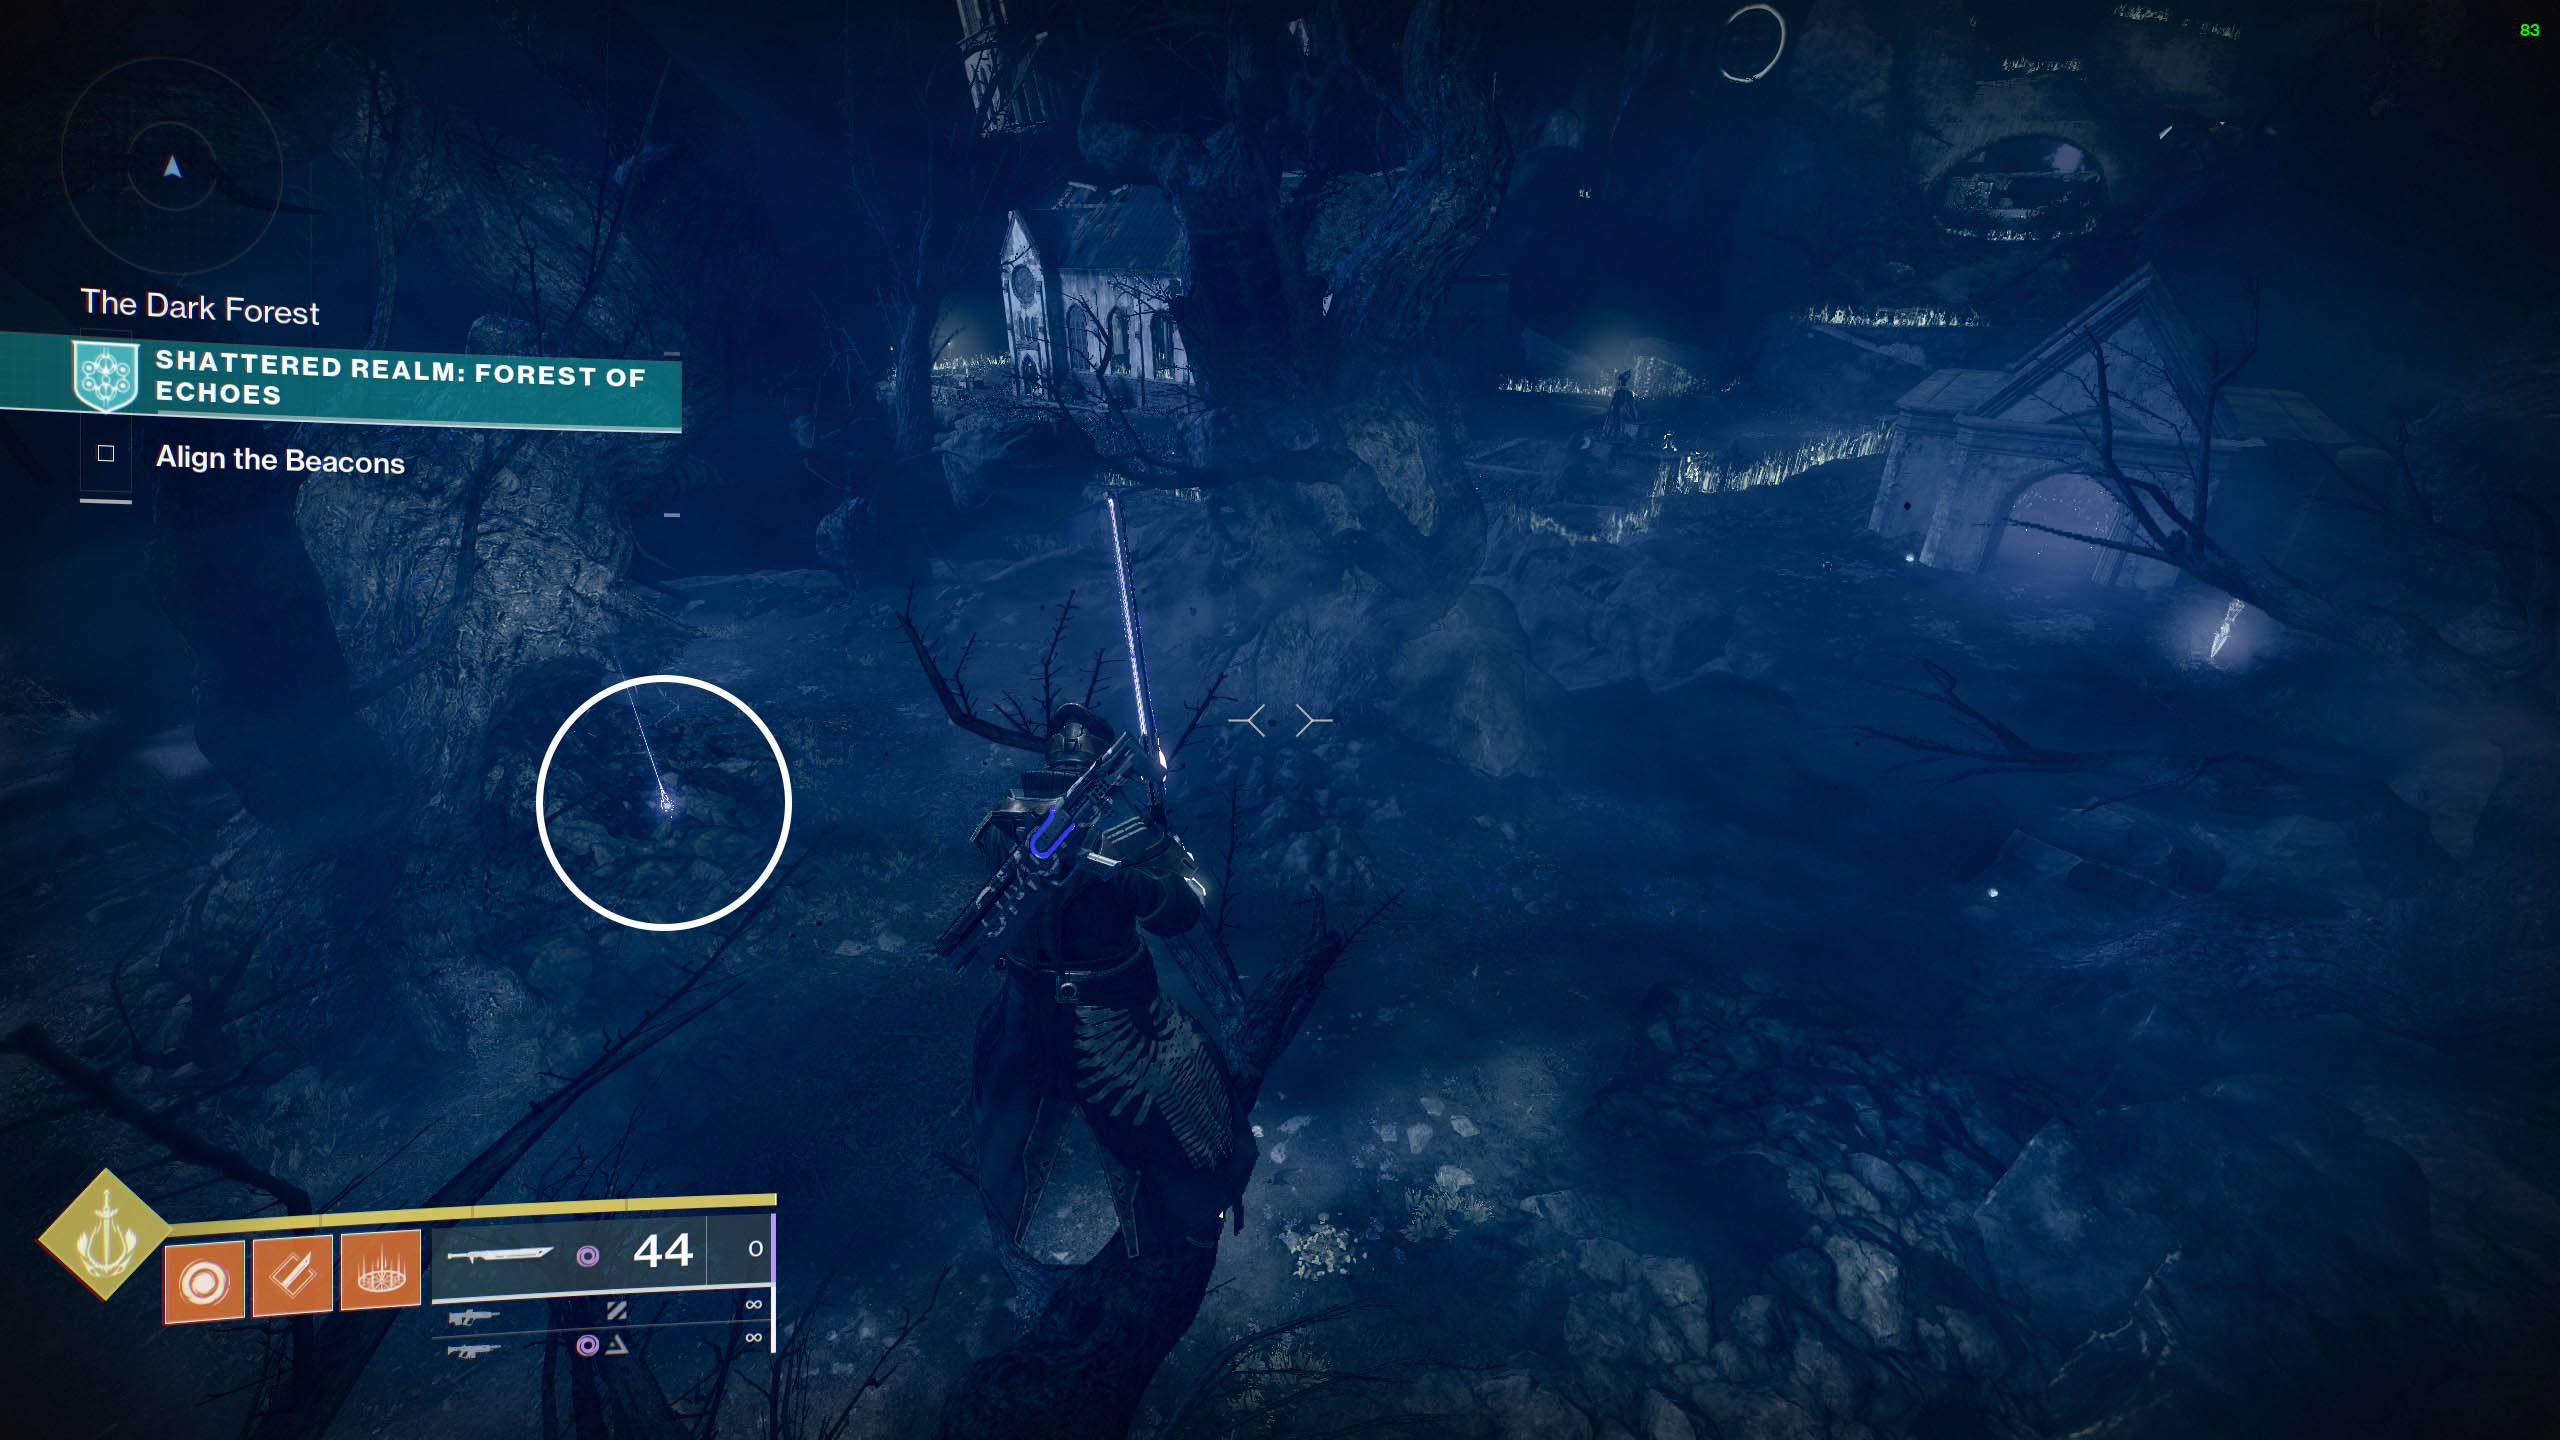 destiny 2 ascendant anchors forest of echoes